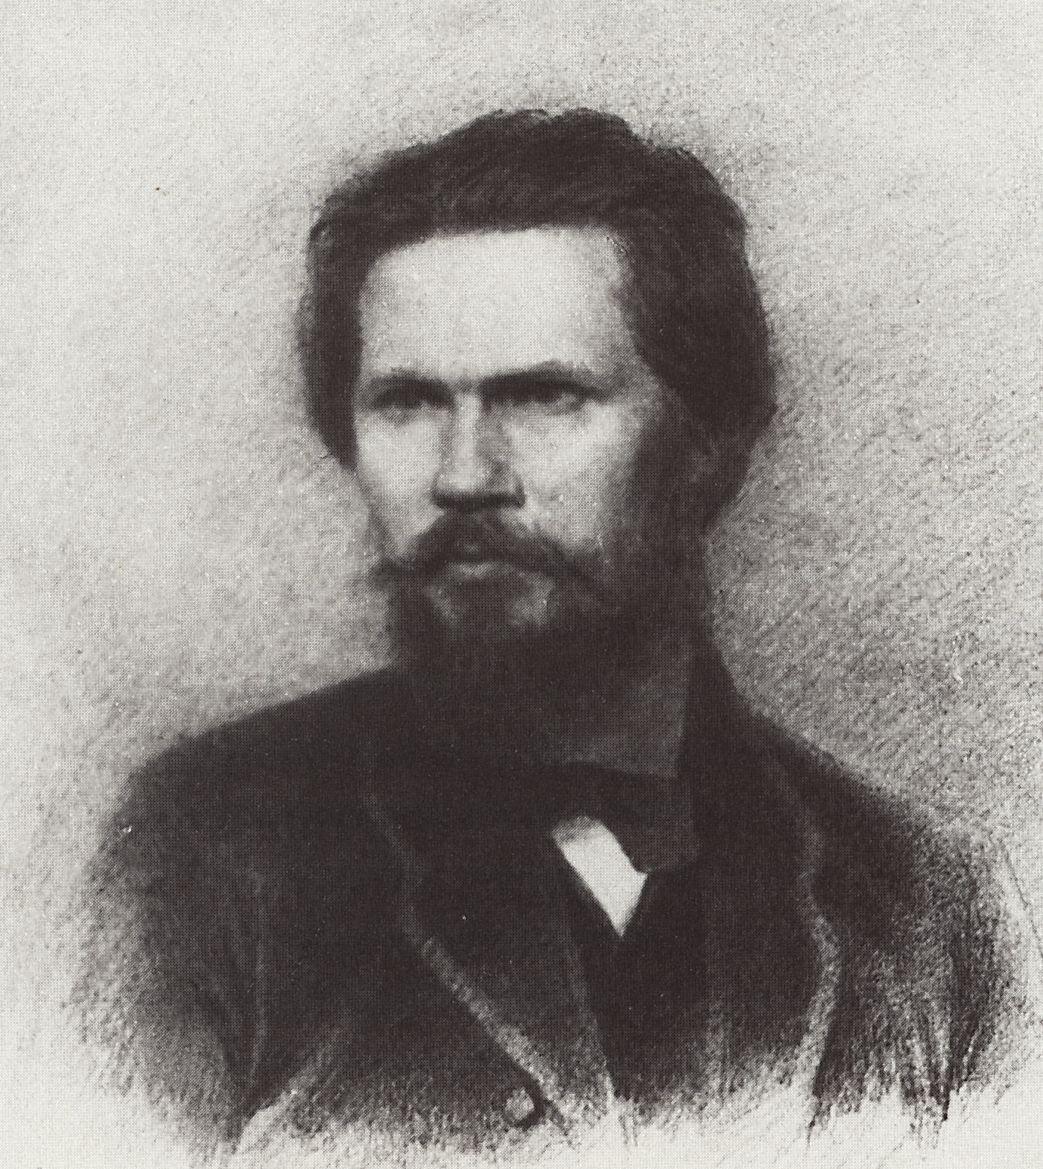 Архип Иванович Куинджи. Портрет И.Н. Крамского